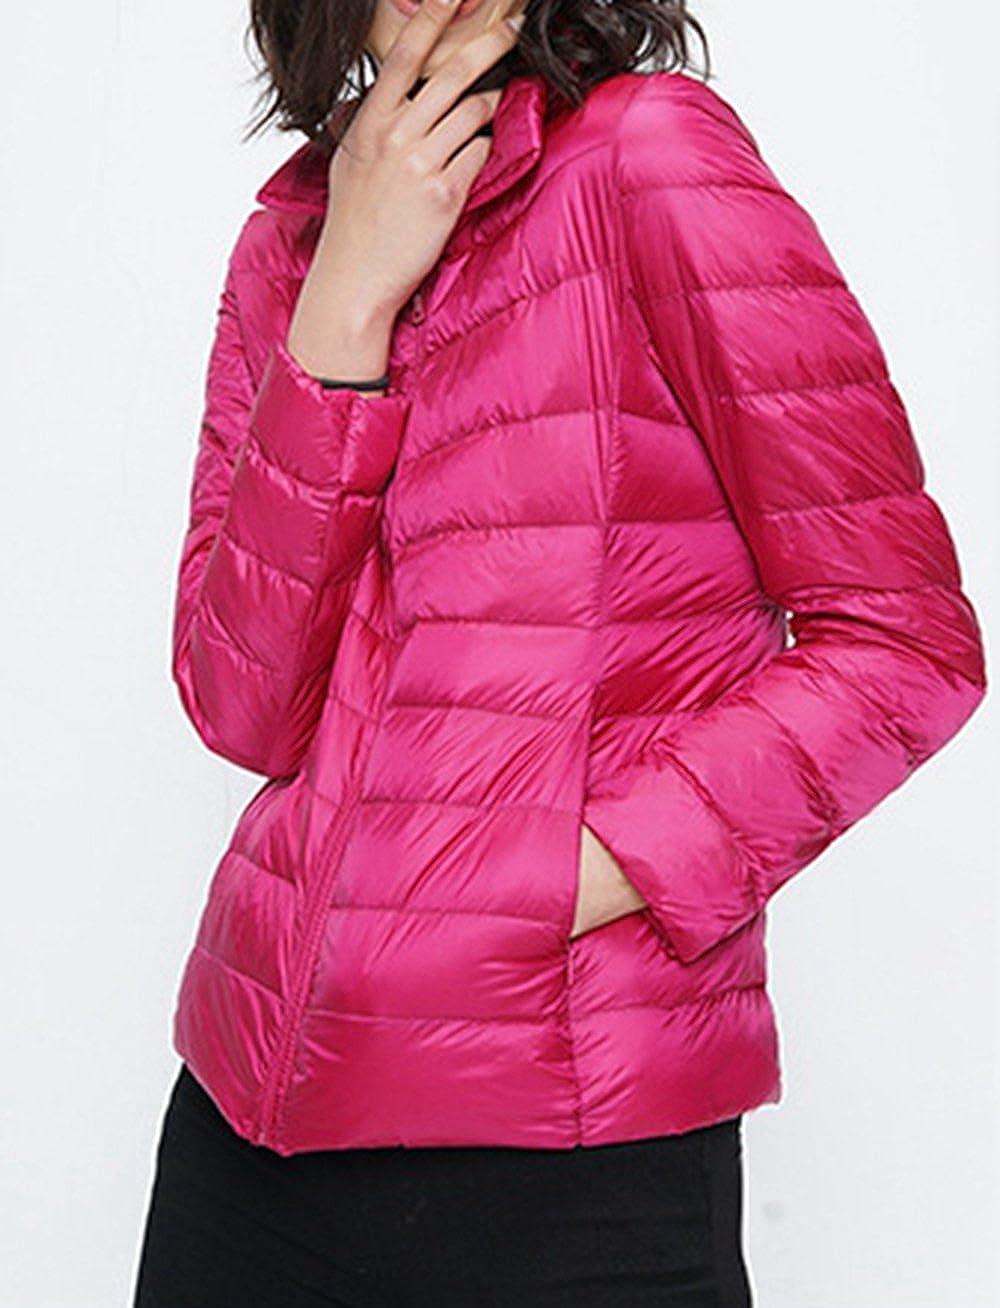 Memorose Womens Casual Winter Turtleneck Quilted Long Sleeve Zipper Coat Jacket Parka